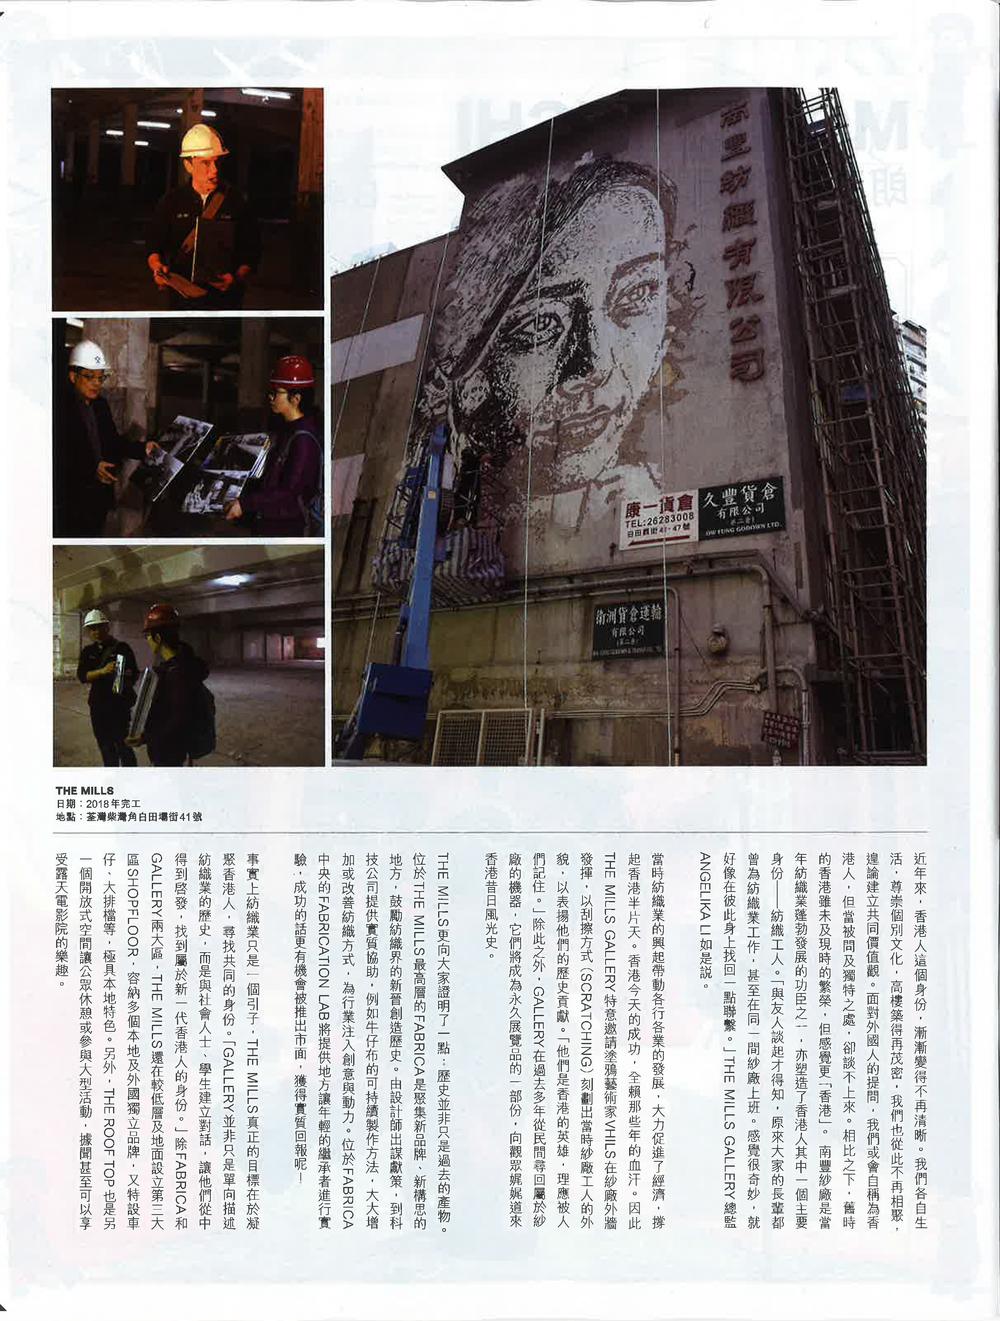 20160121_Vhils_Milk Magazine_02.jpg